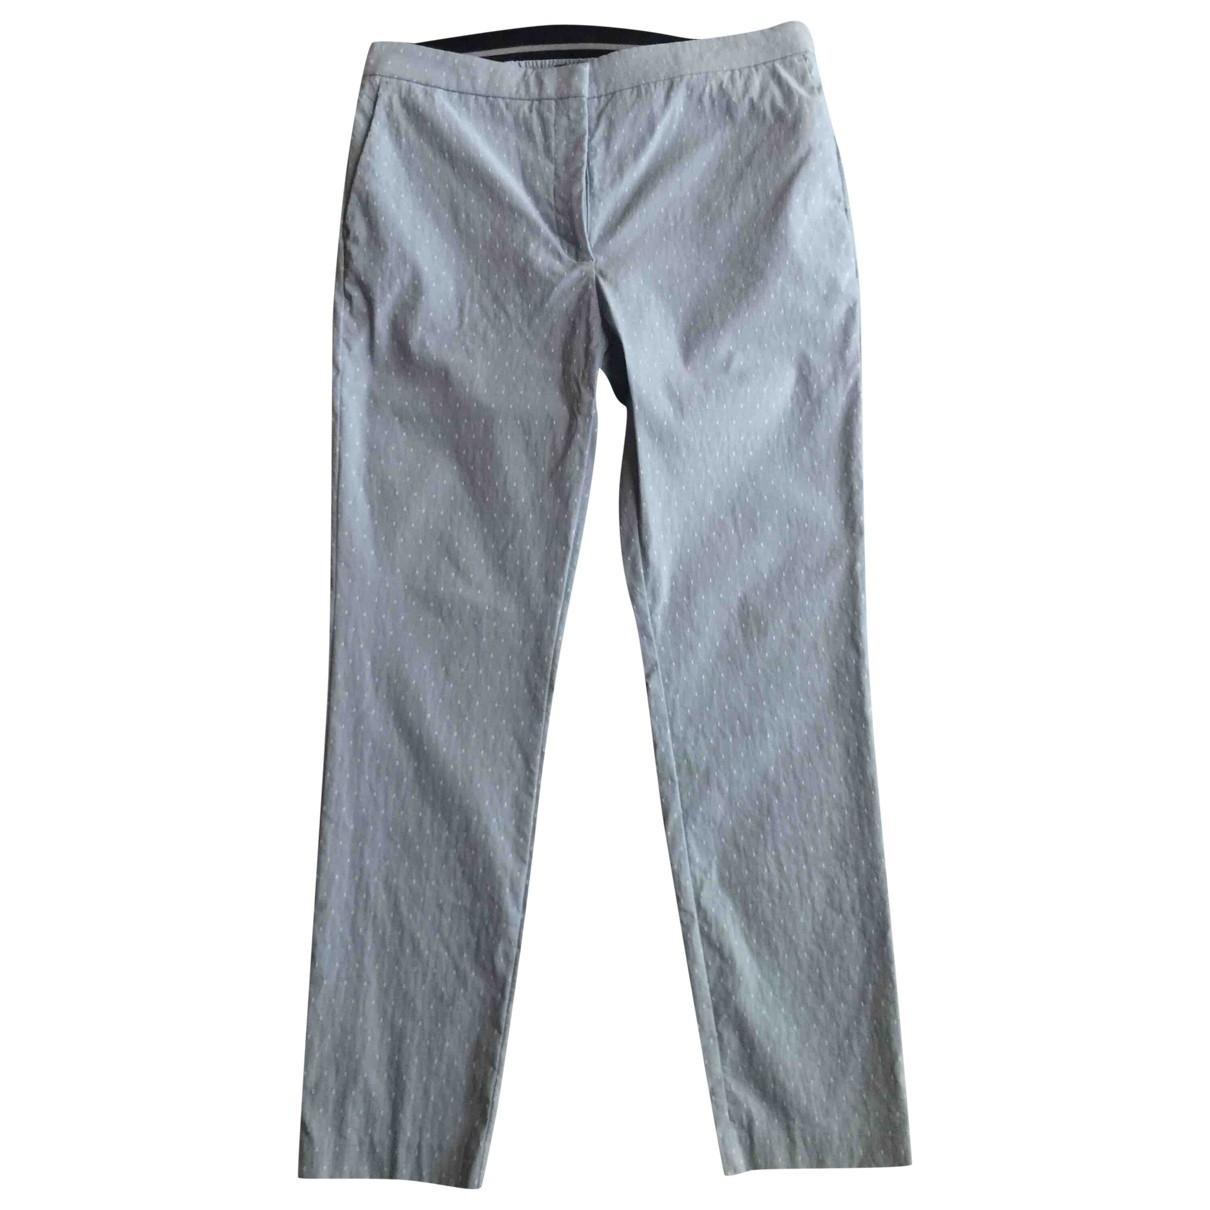 Zara \N Cotton Trousers for Women XL International